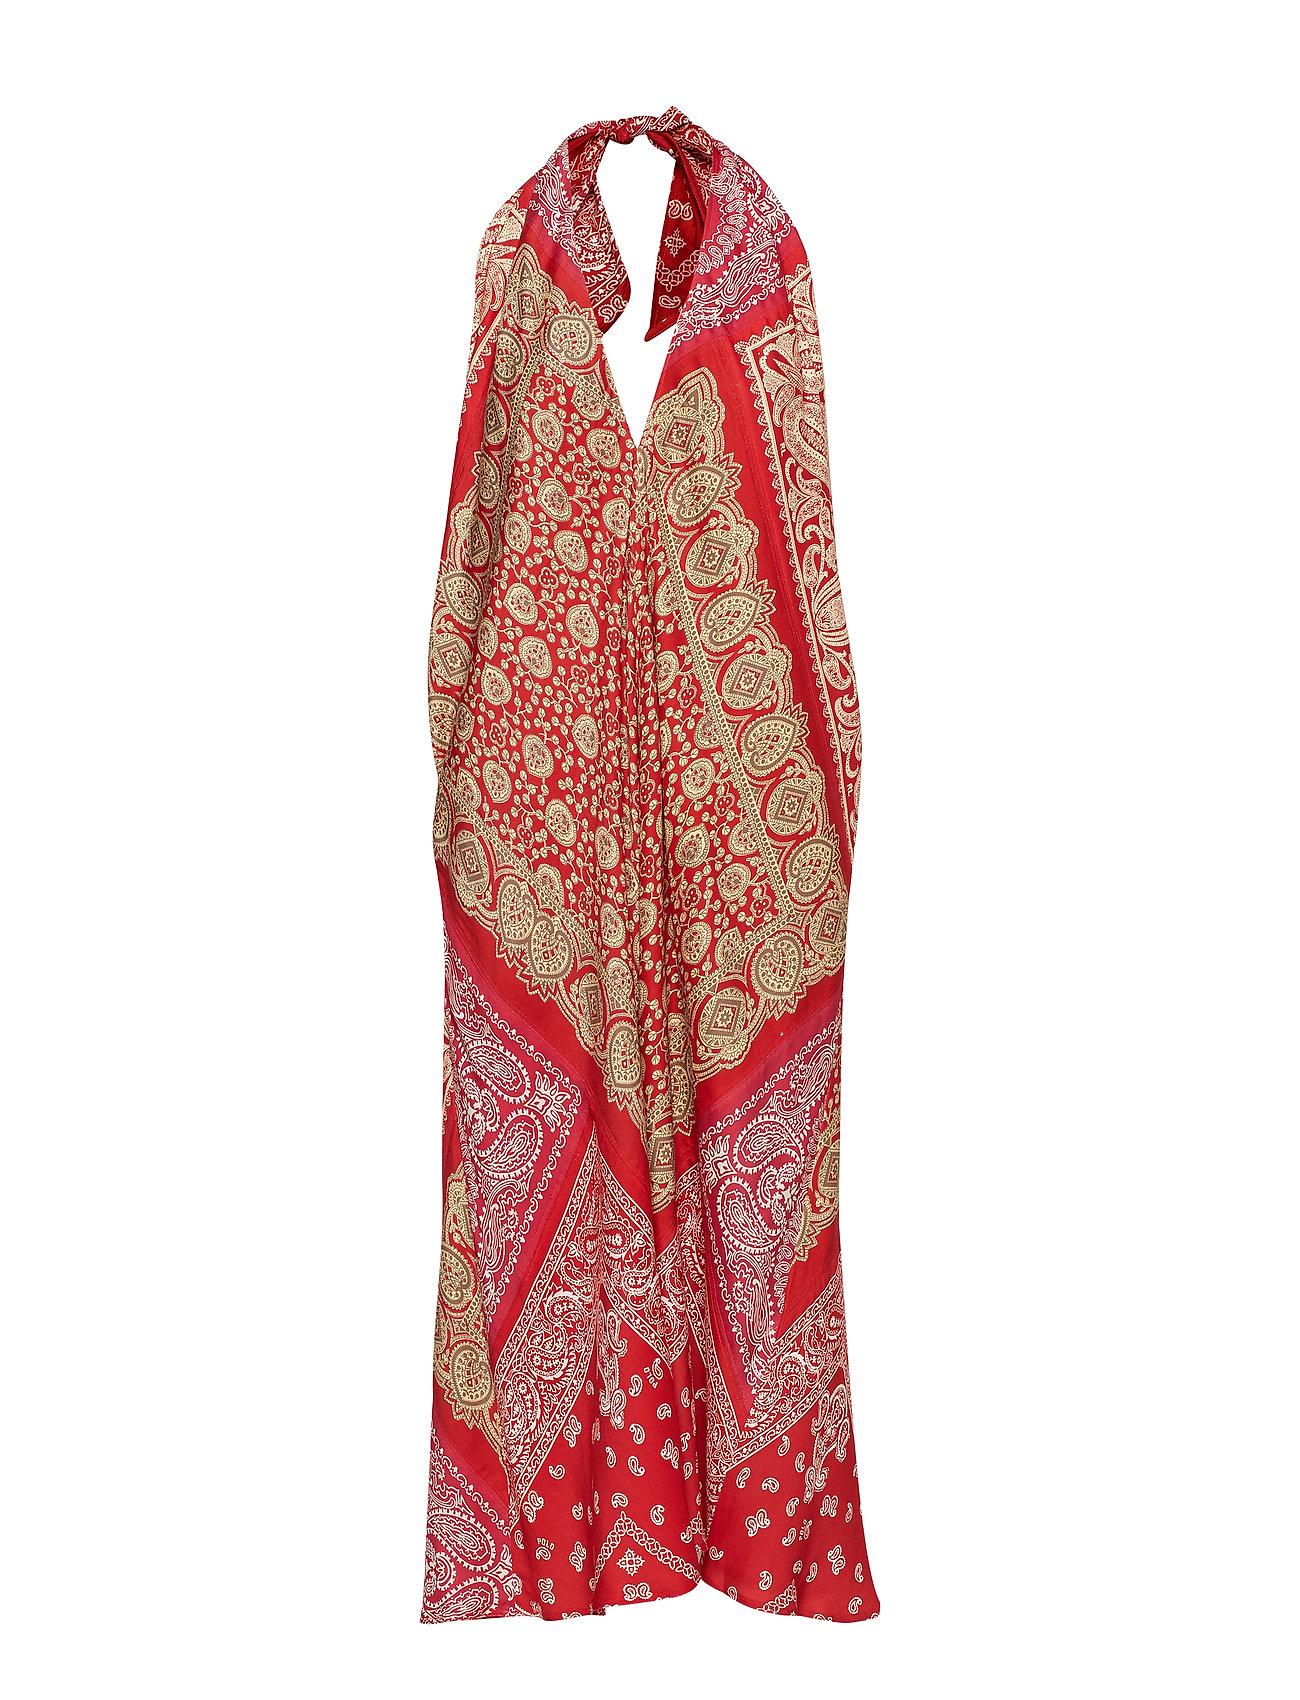 Polo Ralph Lauren Bandanna-Print Halter Dress - RED BANDANA PRINT